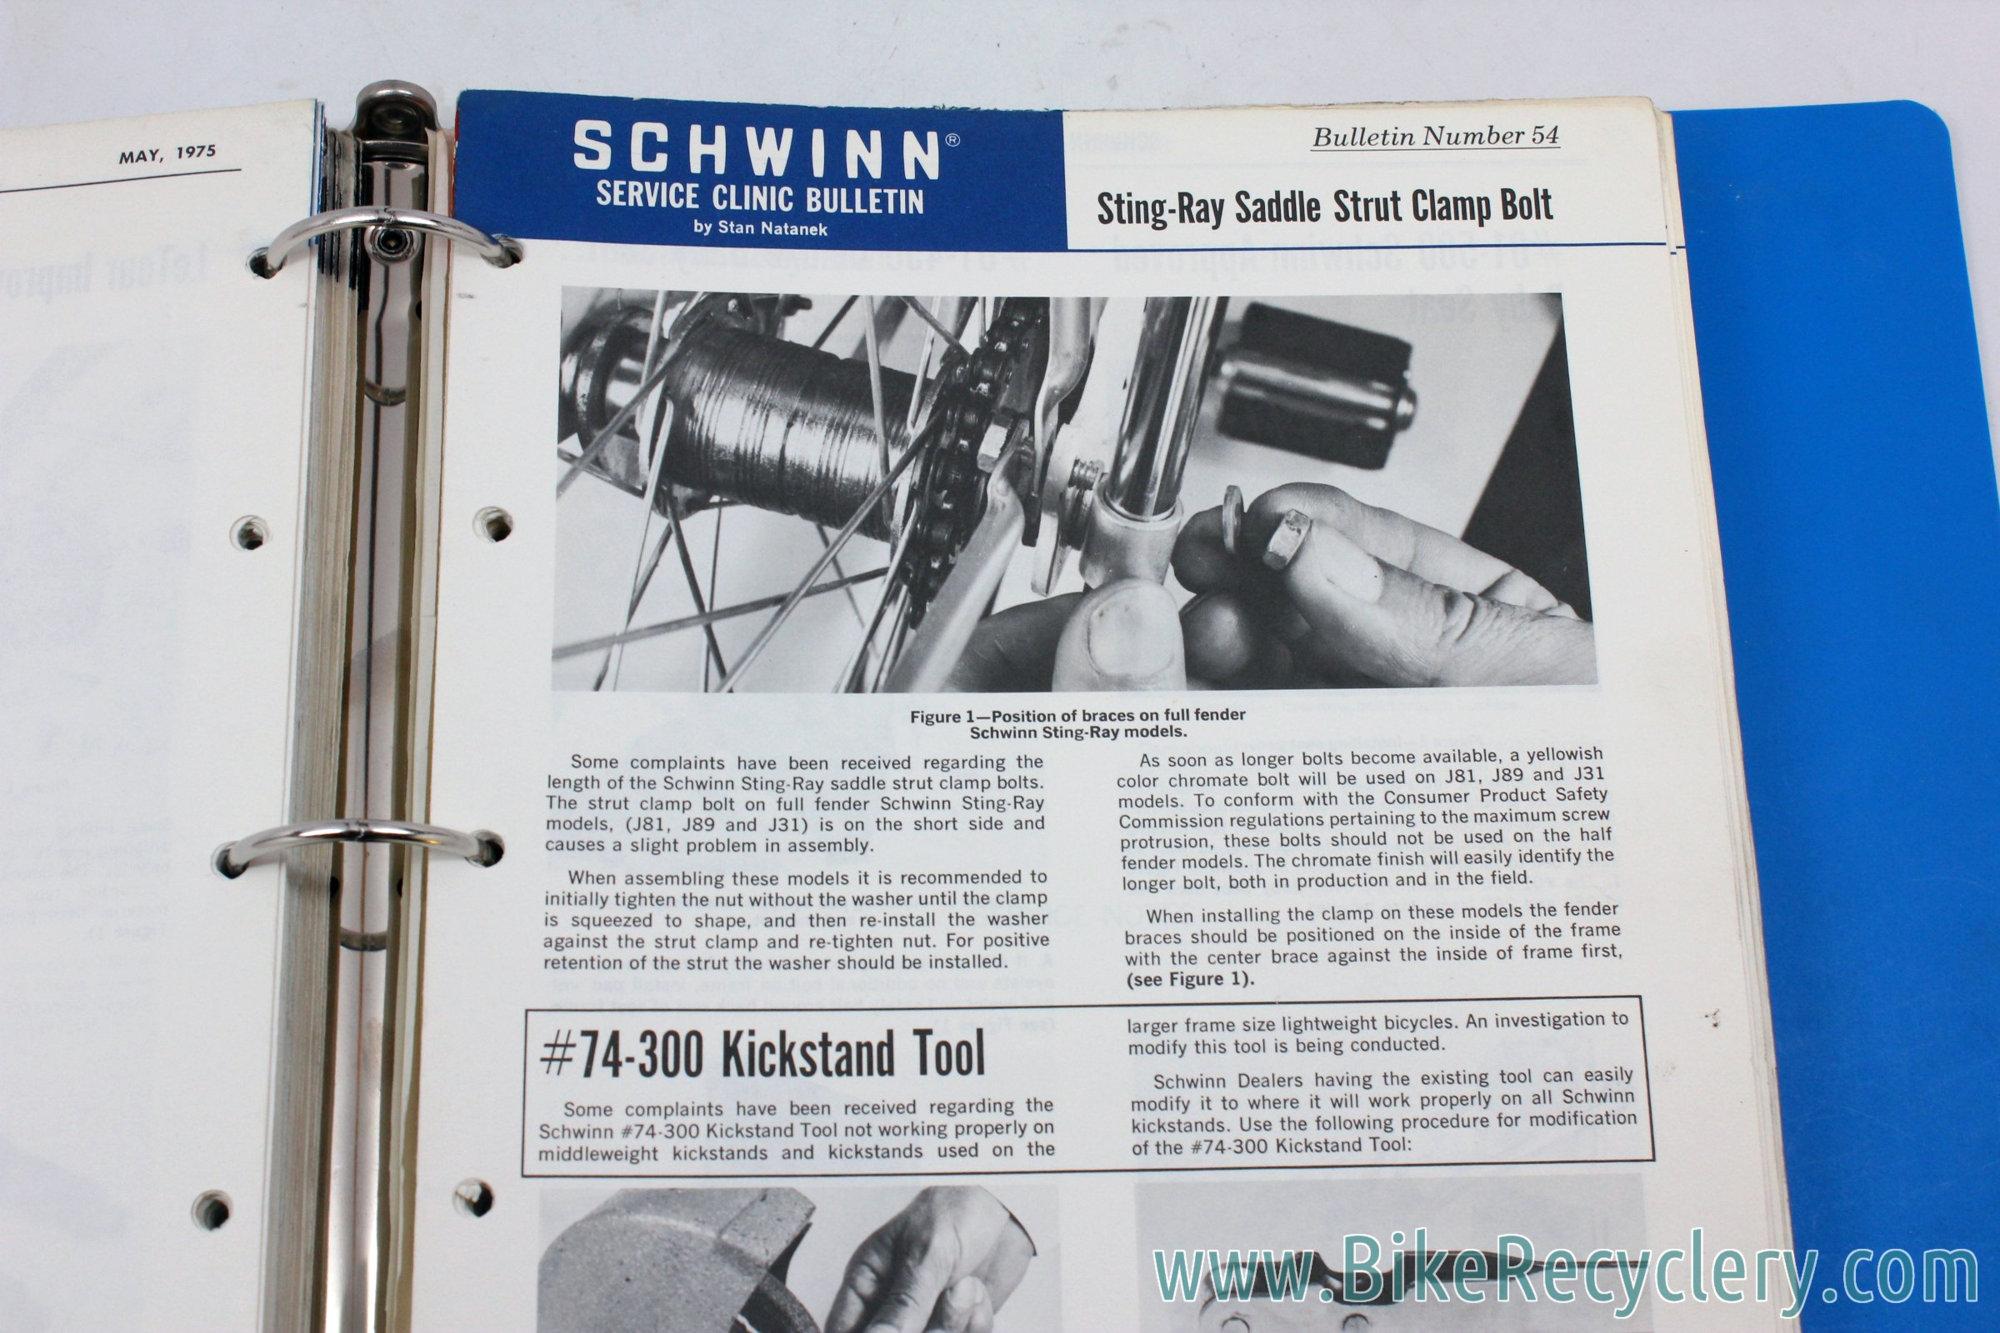 vintage_schwinn_memorabilia_catalogs_dealer_service_manuals_17766.JPG